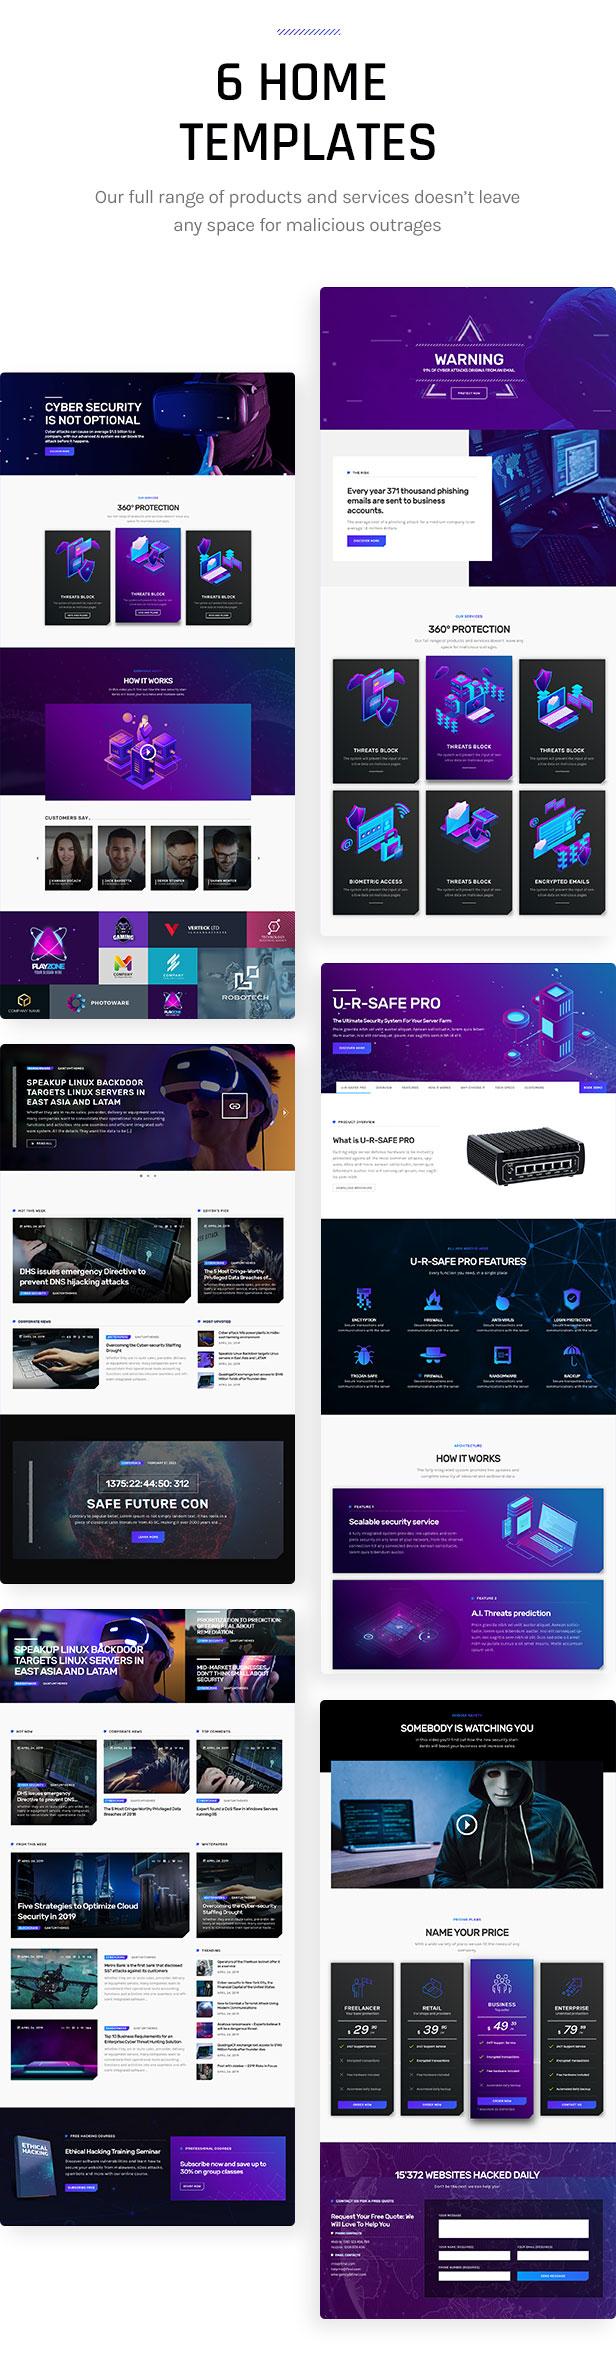 Firwl - Cyber Security WordPress Theme - 3